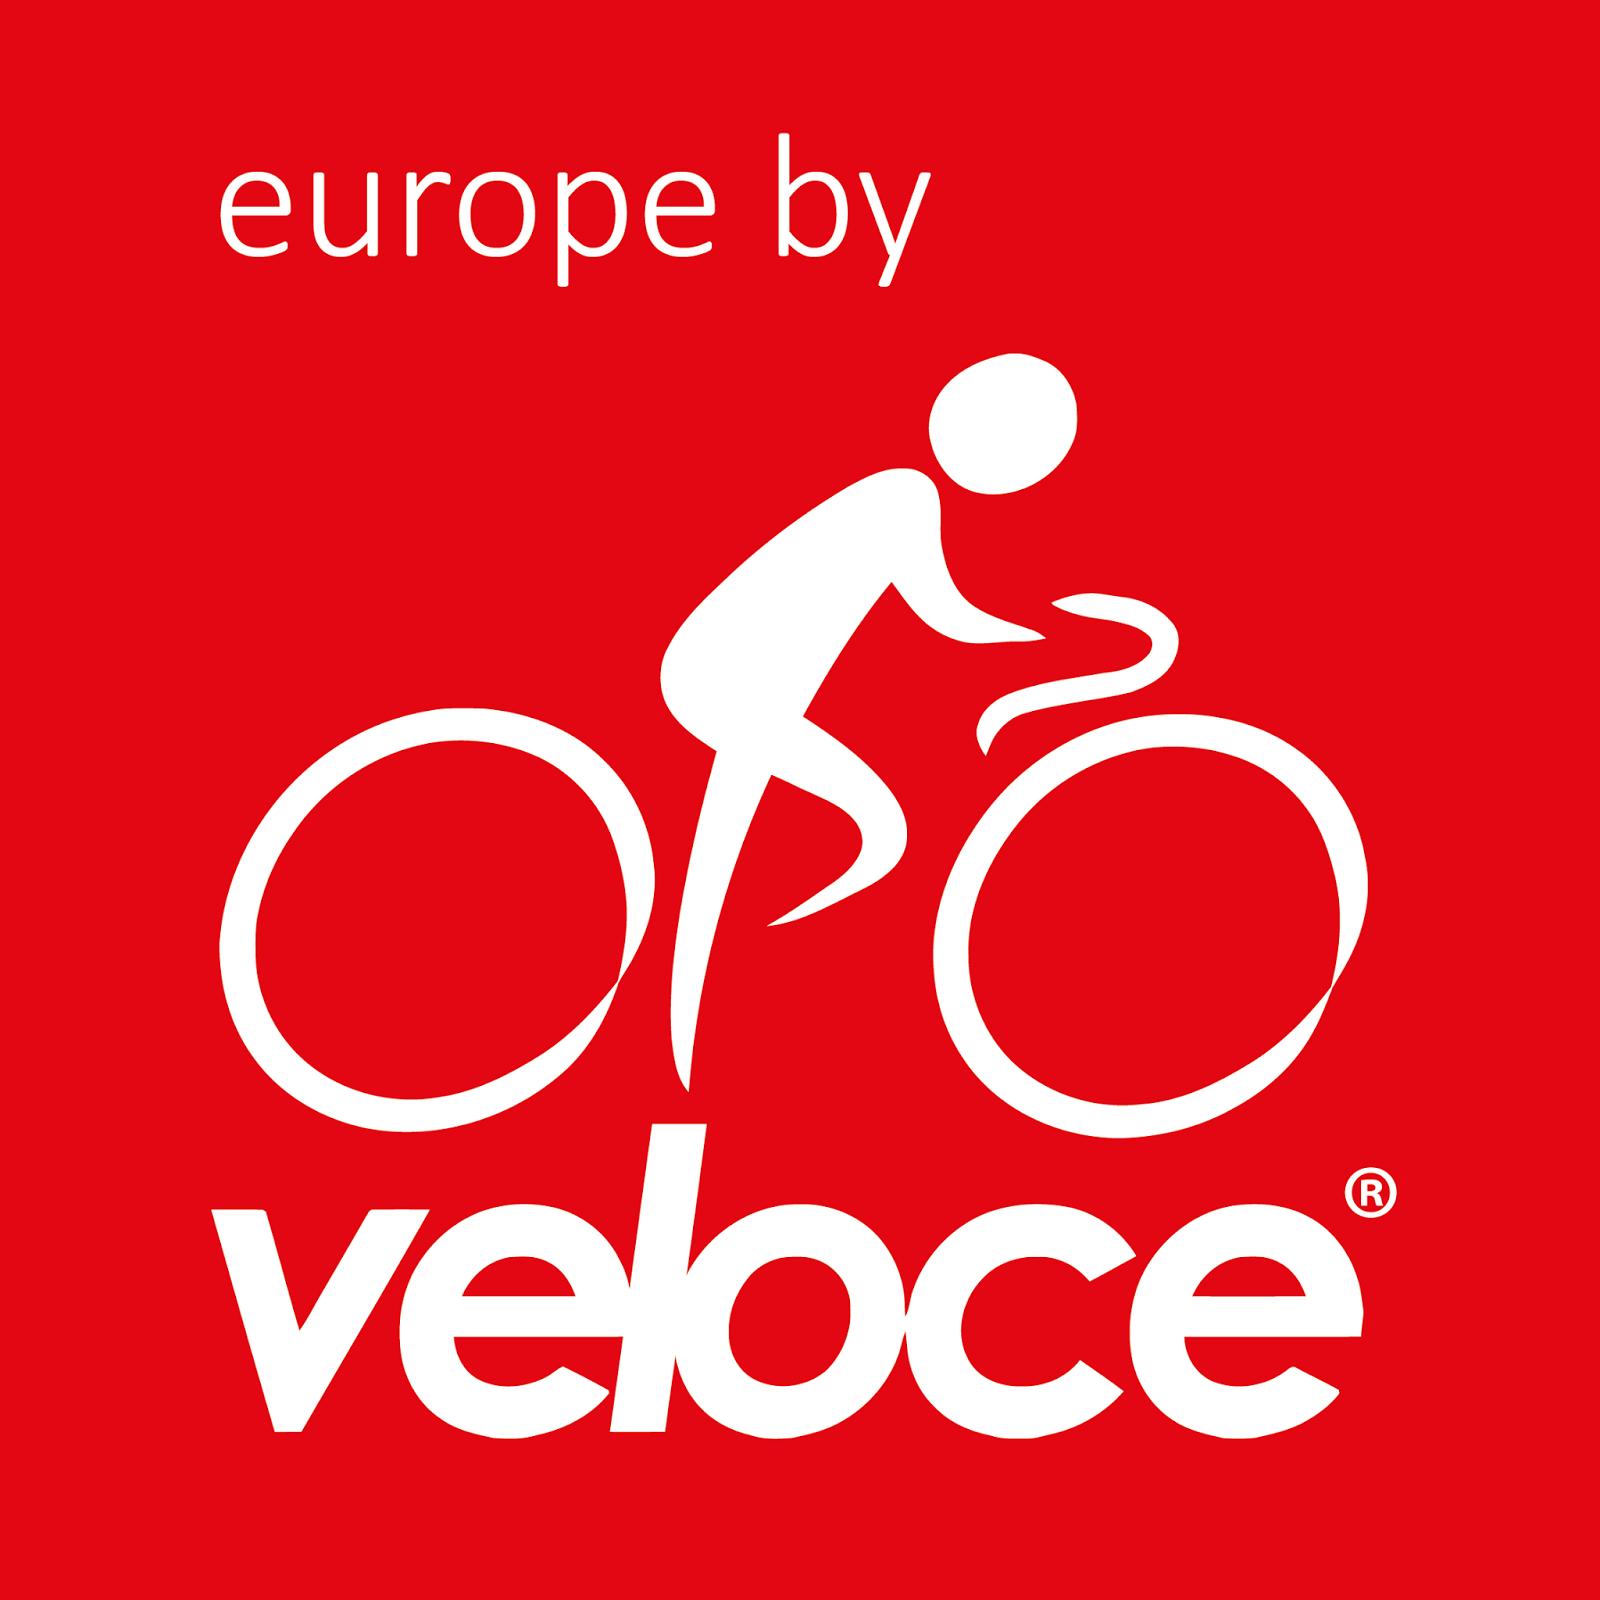 Veloce Cycling And Bike Rental Company Bicycle Rental # Muebles Koperi Merida